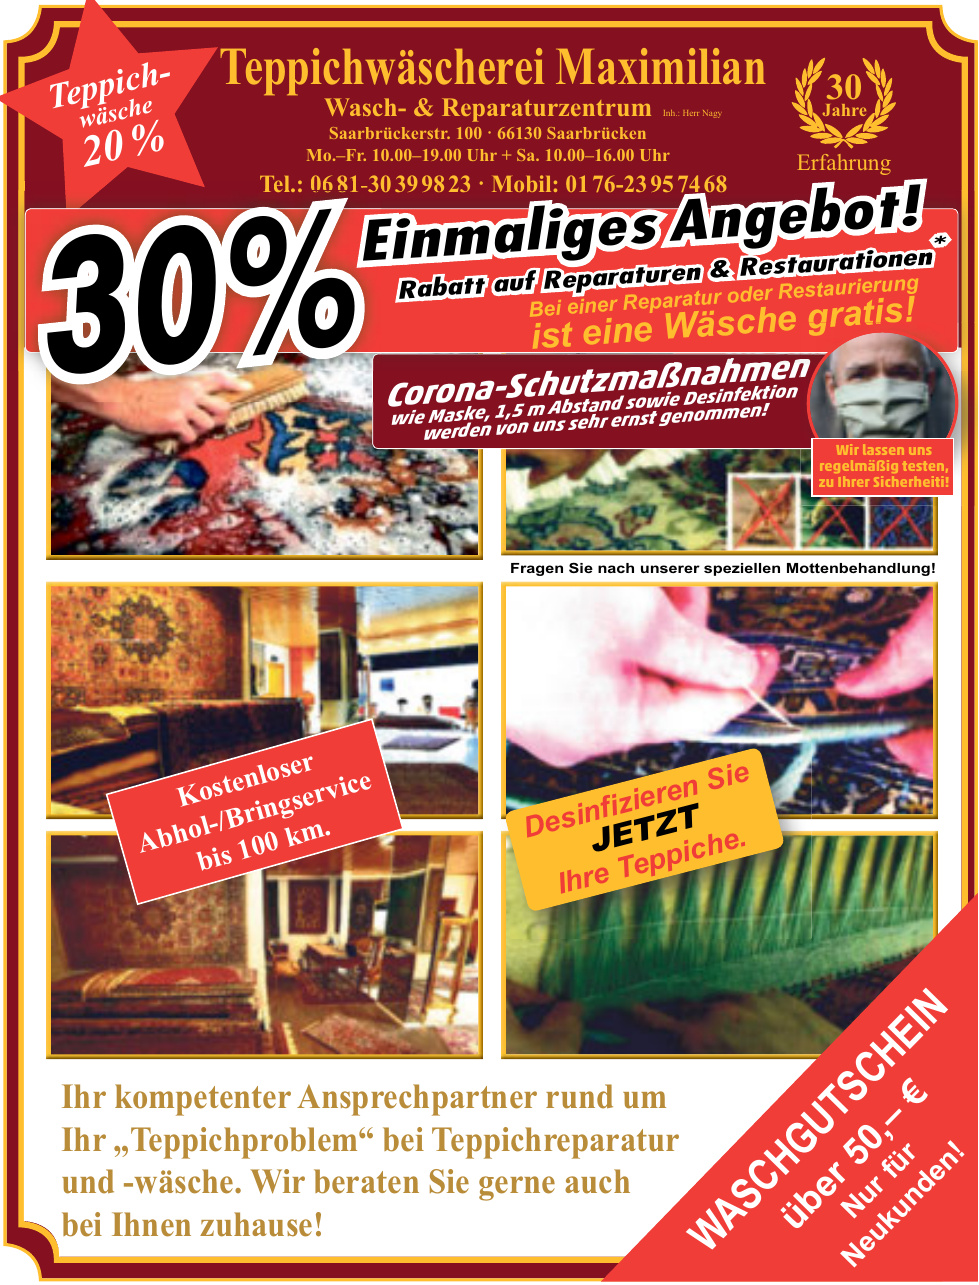 Teppichwäscherei Maximilian